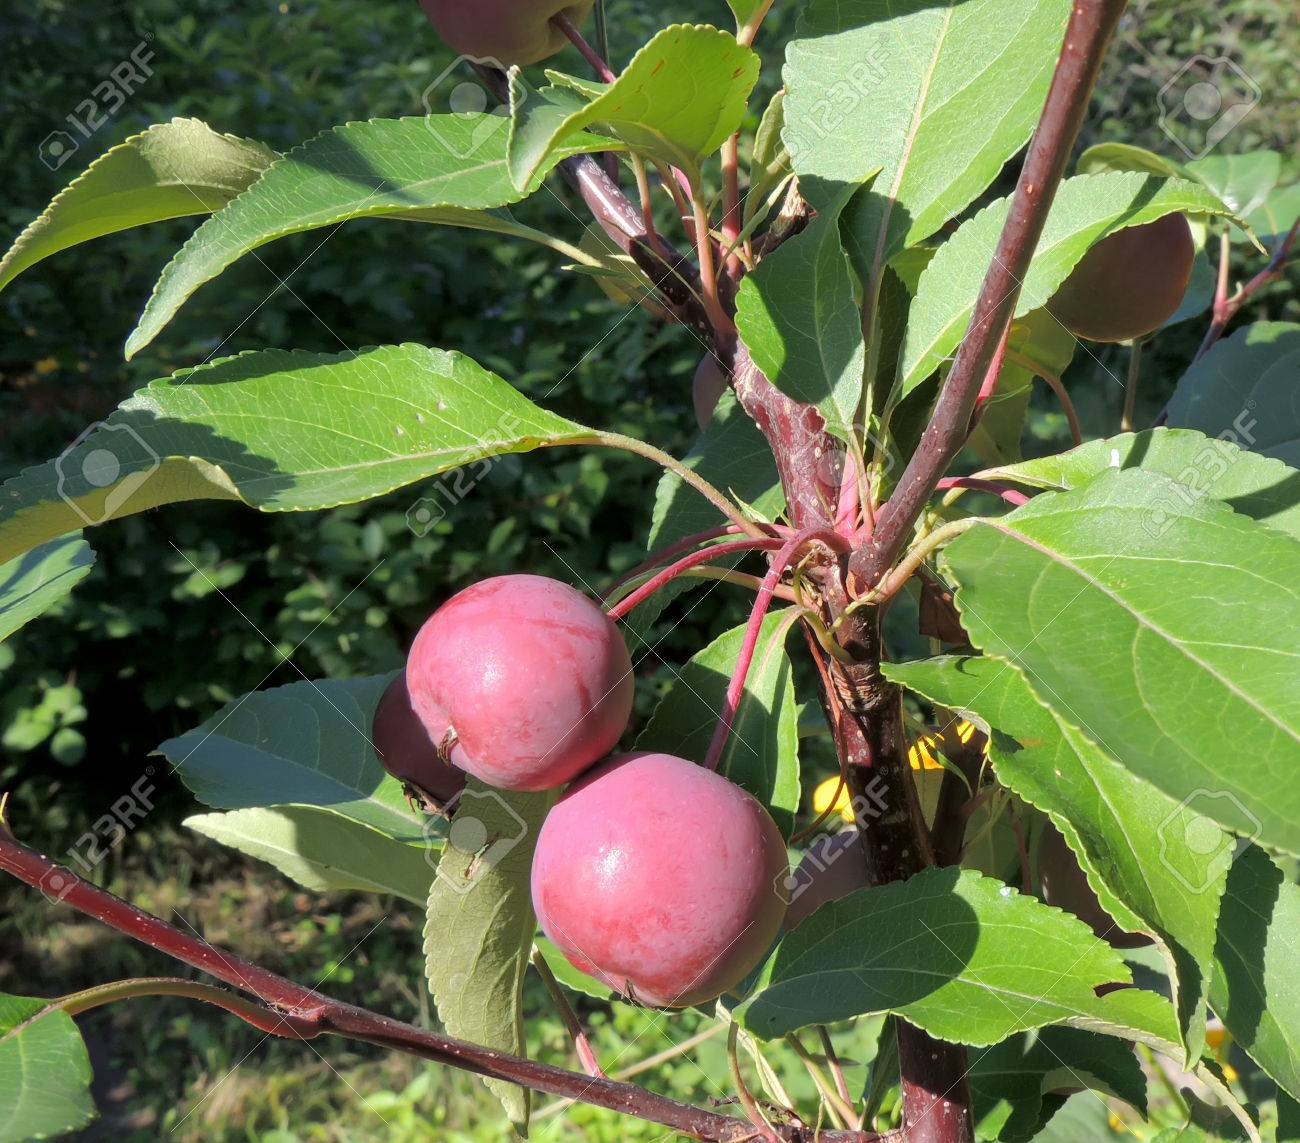 Fruits Of Plumleaf Crab Apple Or Crabapple Tree Or Plum Leaved